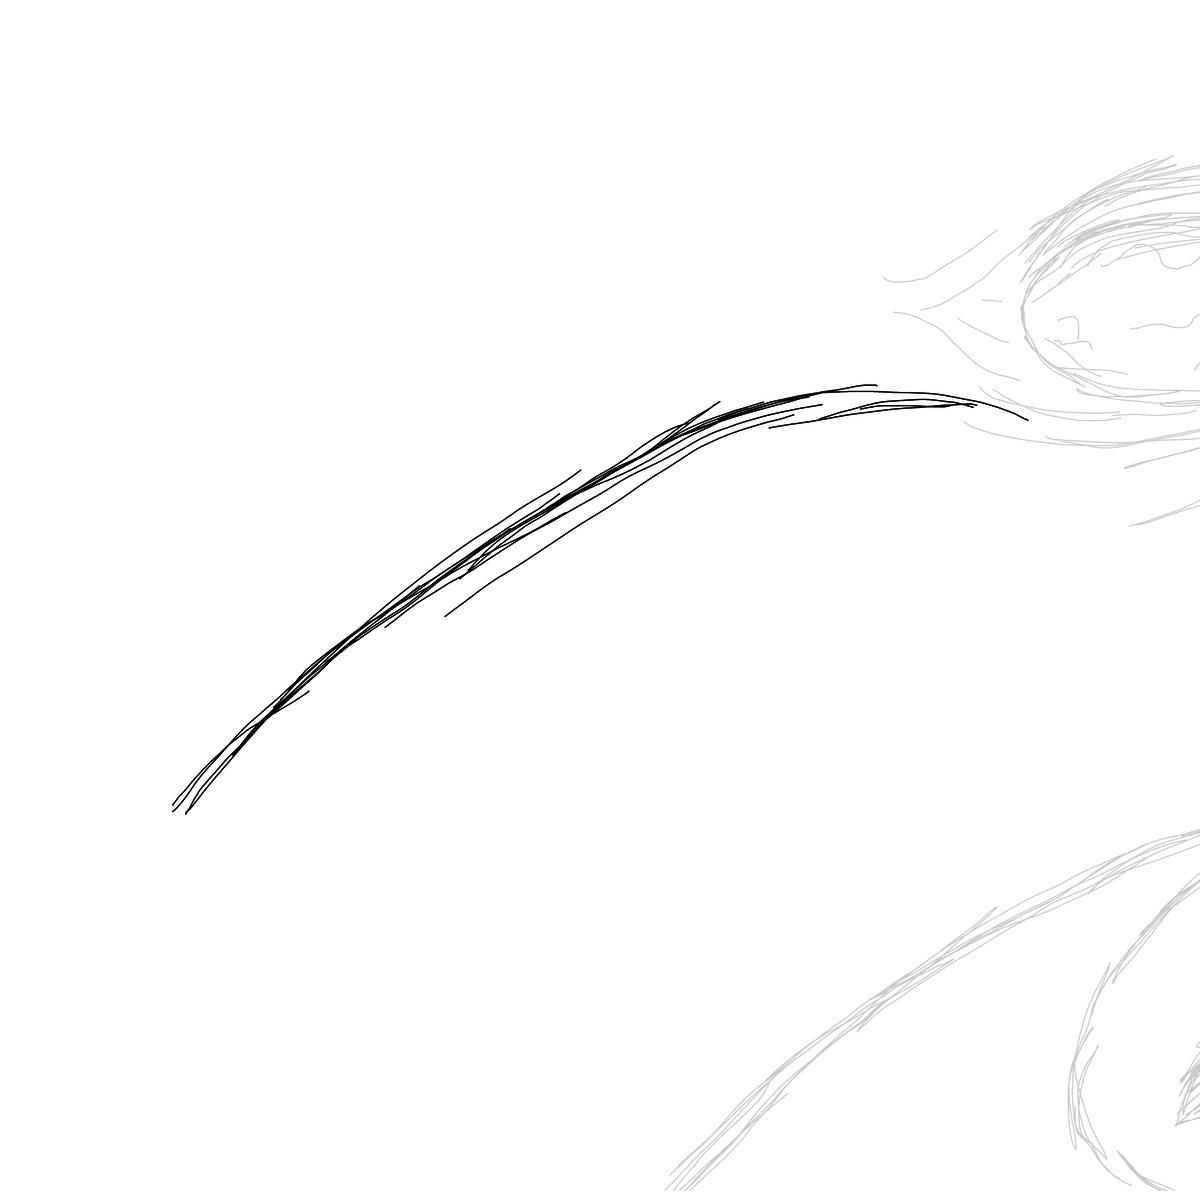 BAAAM drawing#18885 lat:-23.5477199554443360lng: -46.6355552673339840